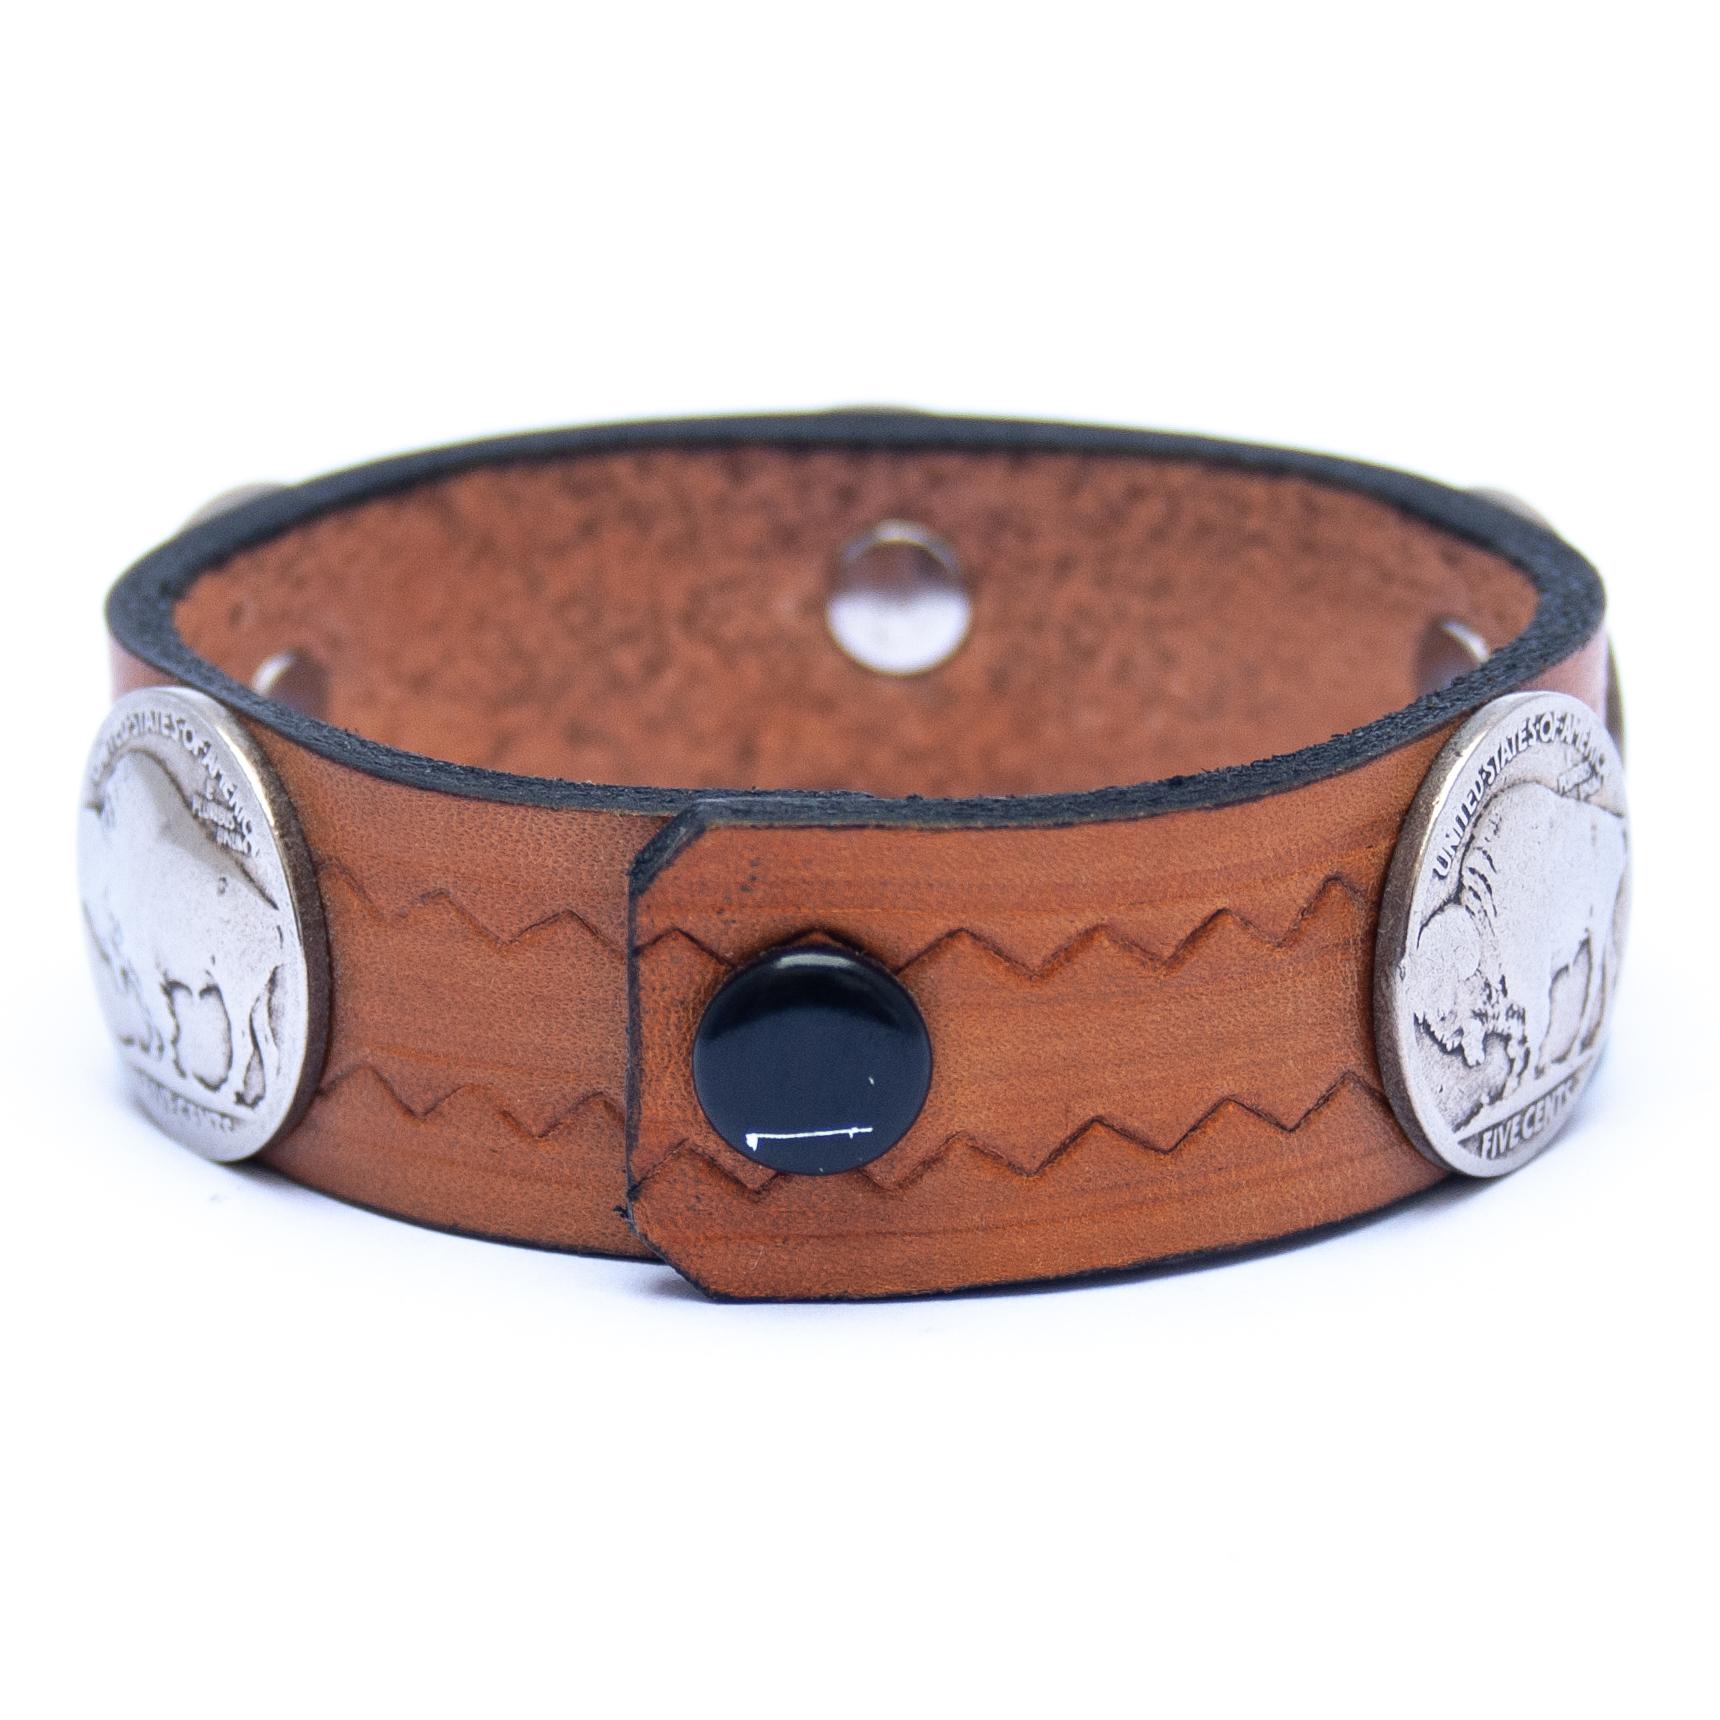 Vintage Buffalo Nickel Coin Tan Leather Bracelet